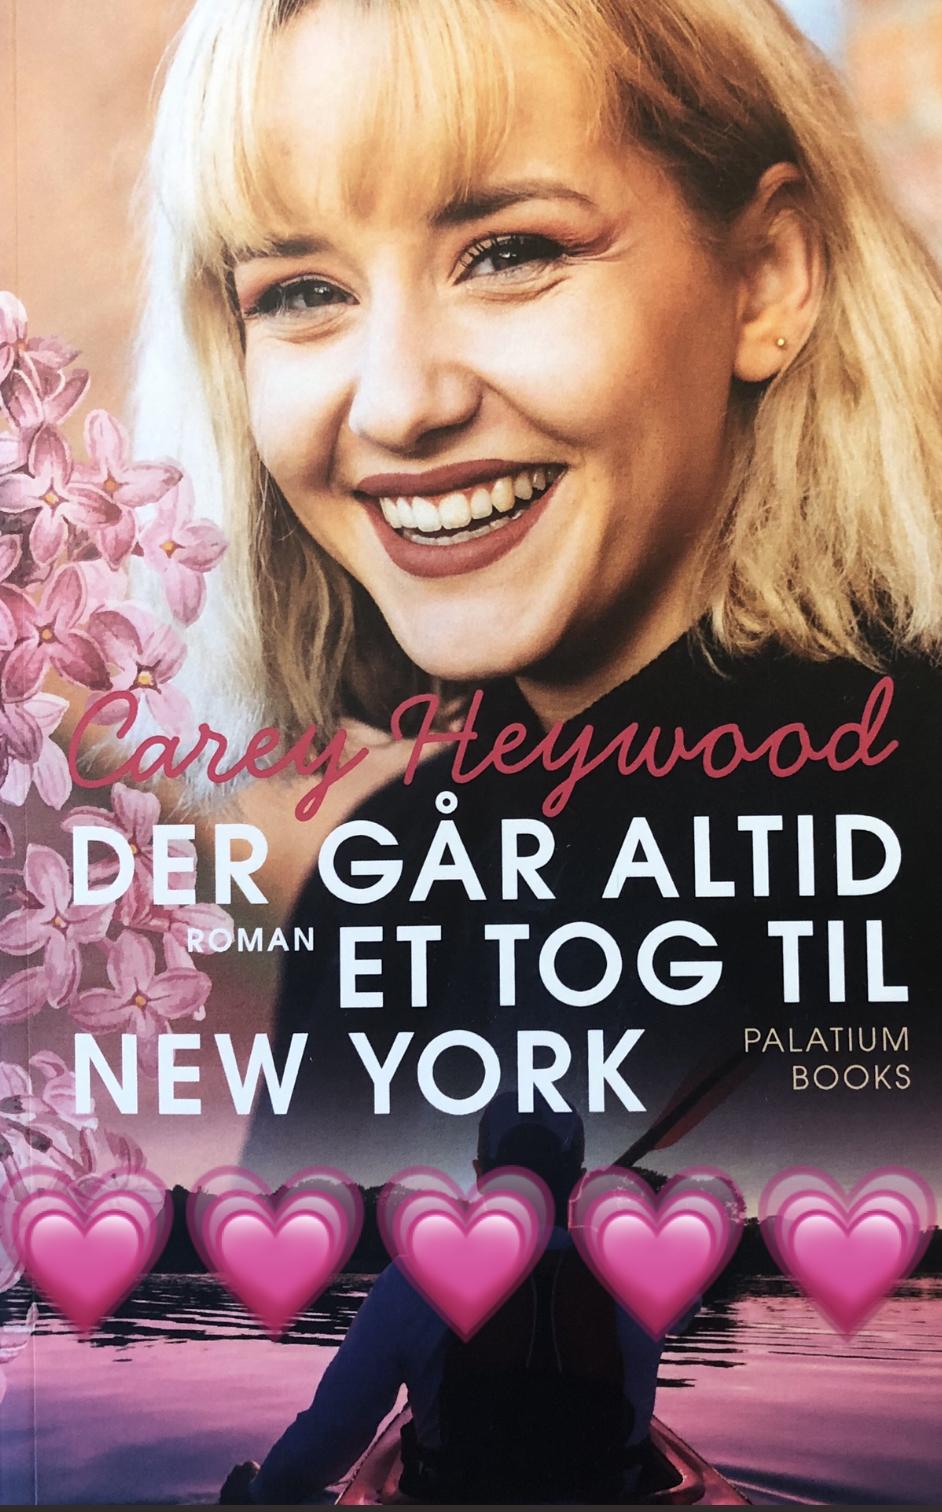 Carey Heywood, Palatiumbooks, Palatium.dk, Der går altid et tog til New York, Woodlake-serien, anmeldelse, boganmeldelse, New adult, krummeskrummelurer, Krummes Krummelurer, krummeskrummelurer.dk, anmeldereksemplar,